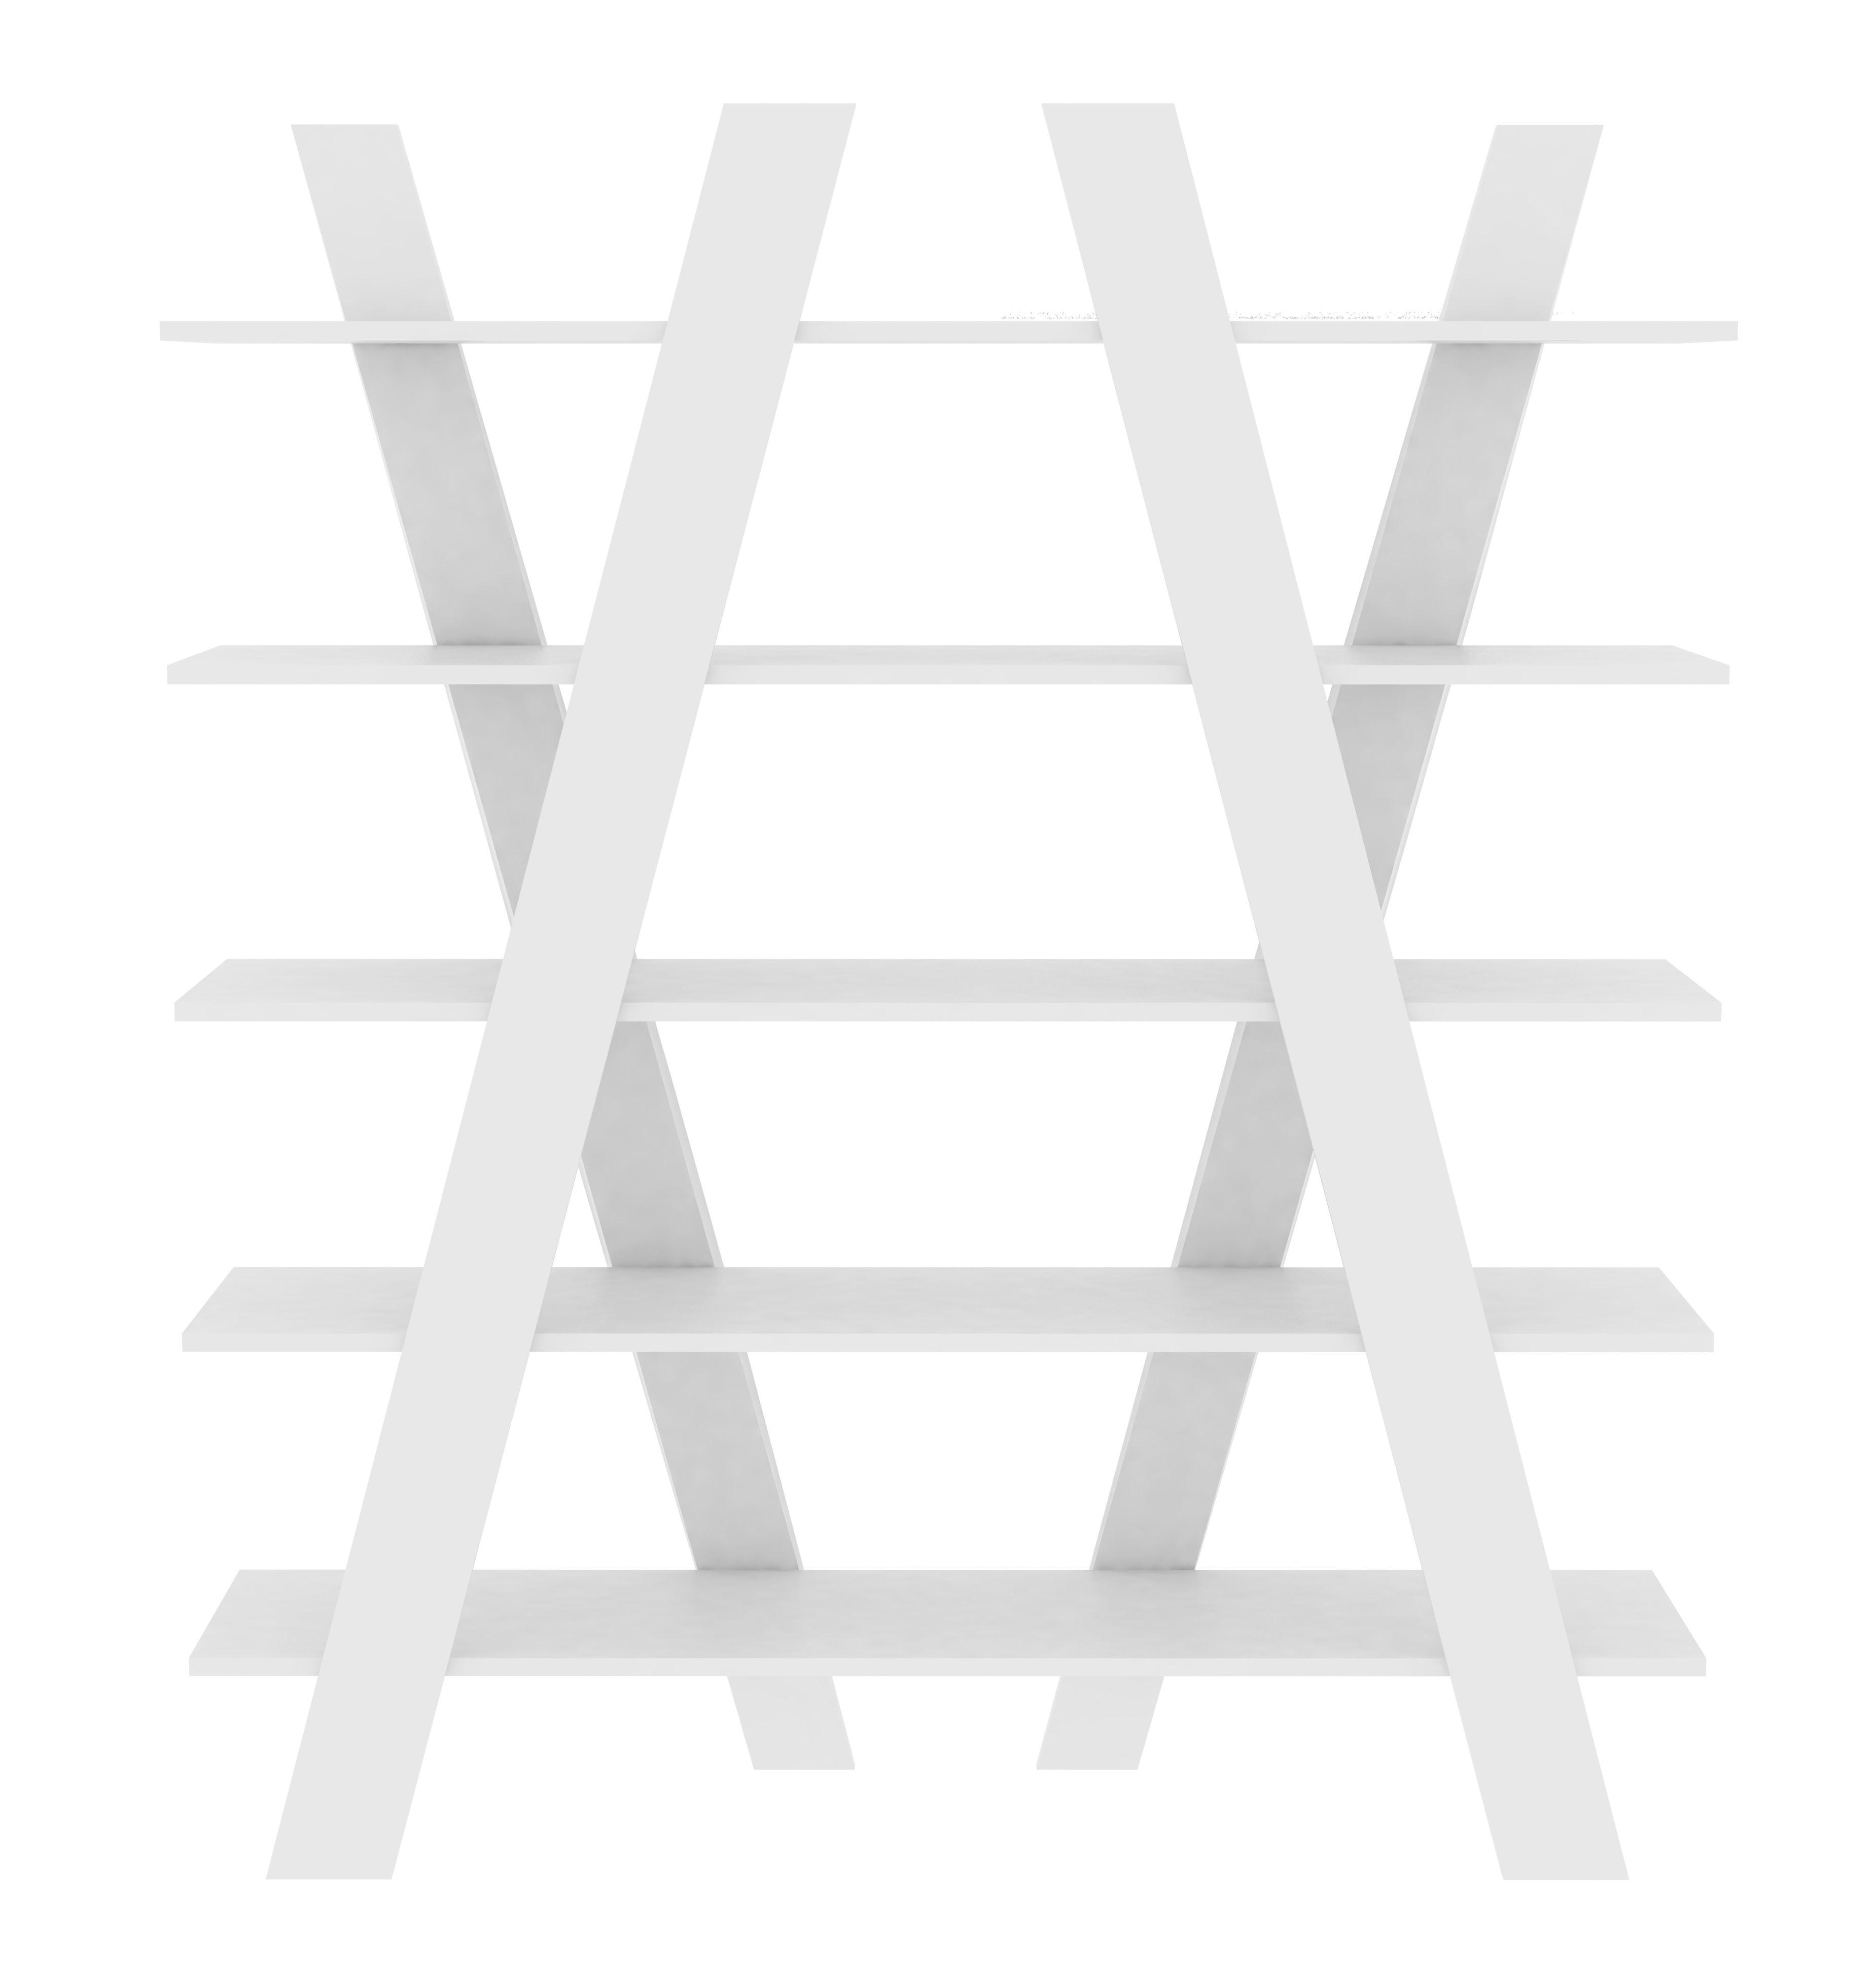 Arredamento - Scaffali e librerie - Libreria Wind / L 156 x H 160 cm - POP UP HOME - Bianco opaco - Agglomerato verniciato